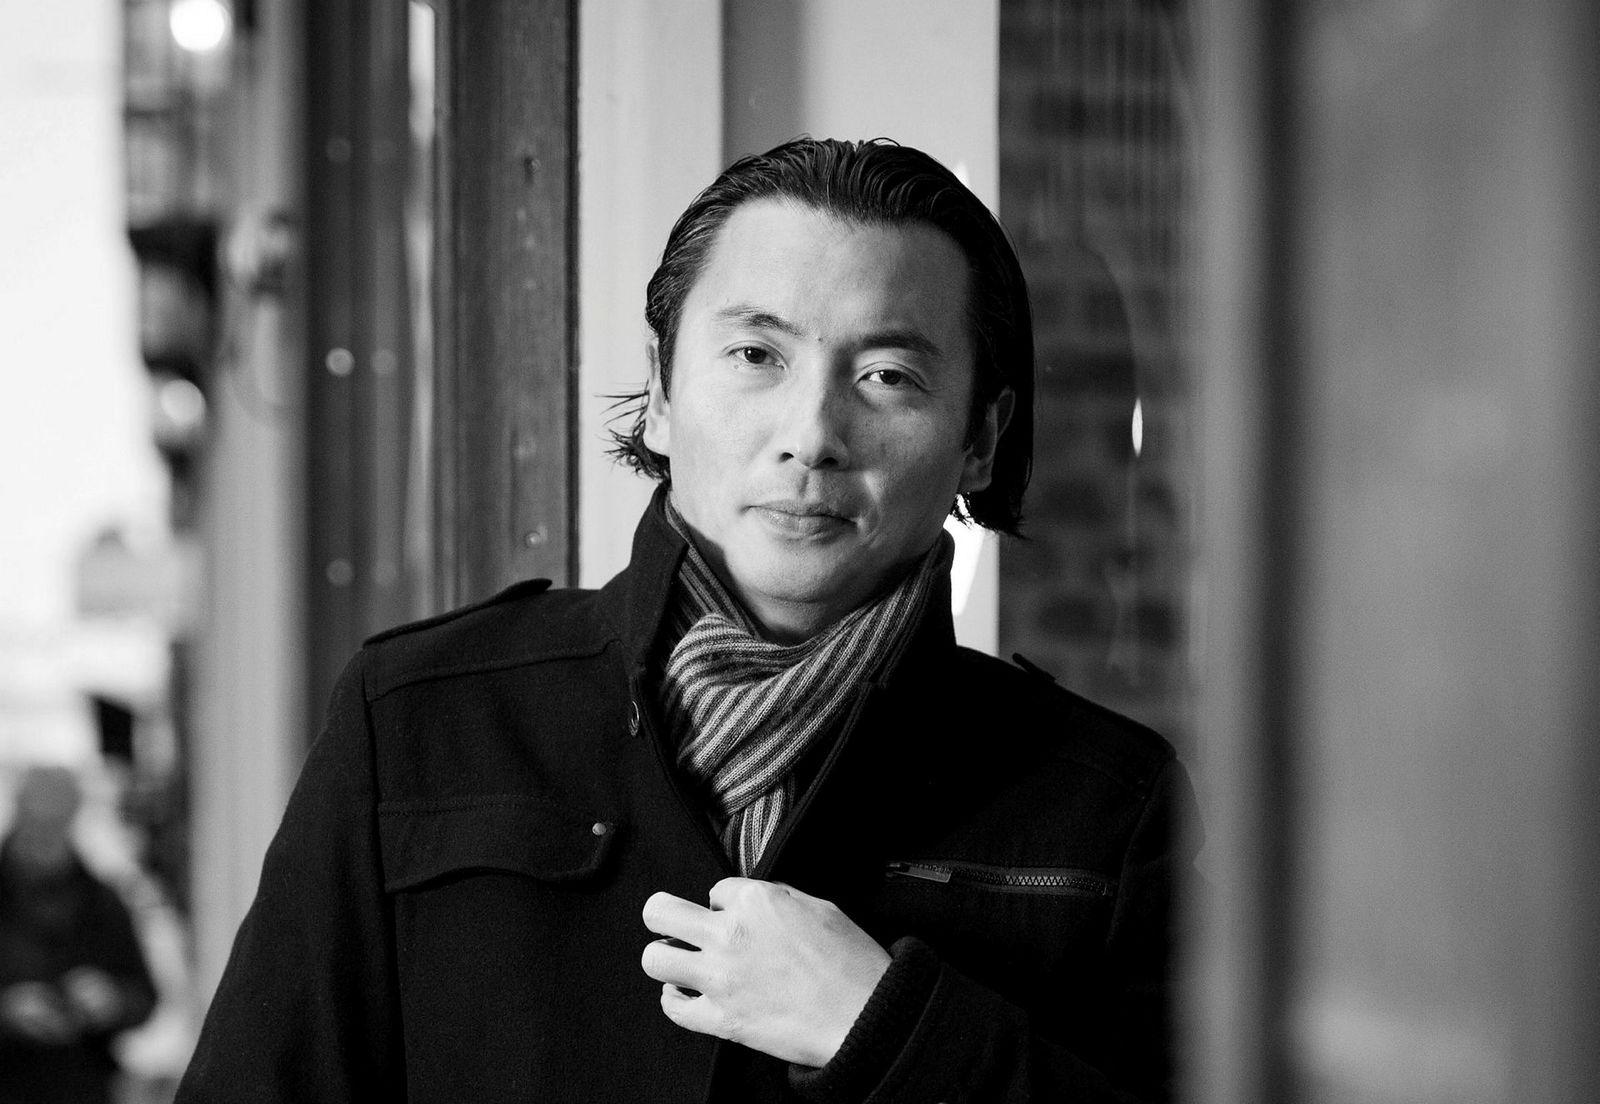 Olav Chen